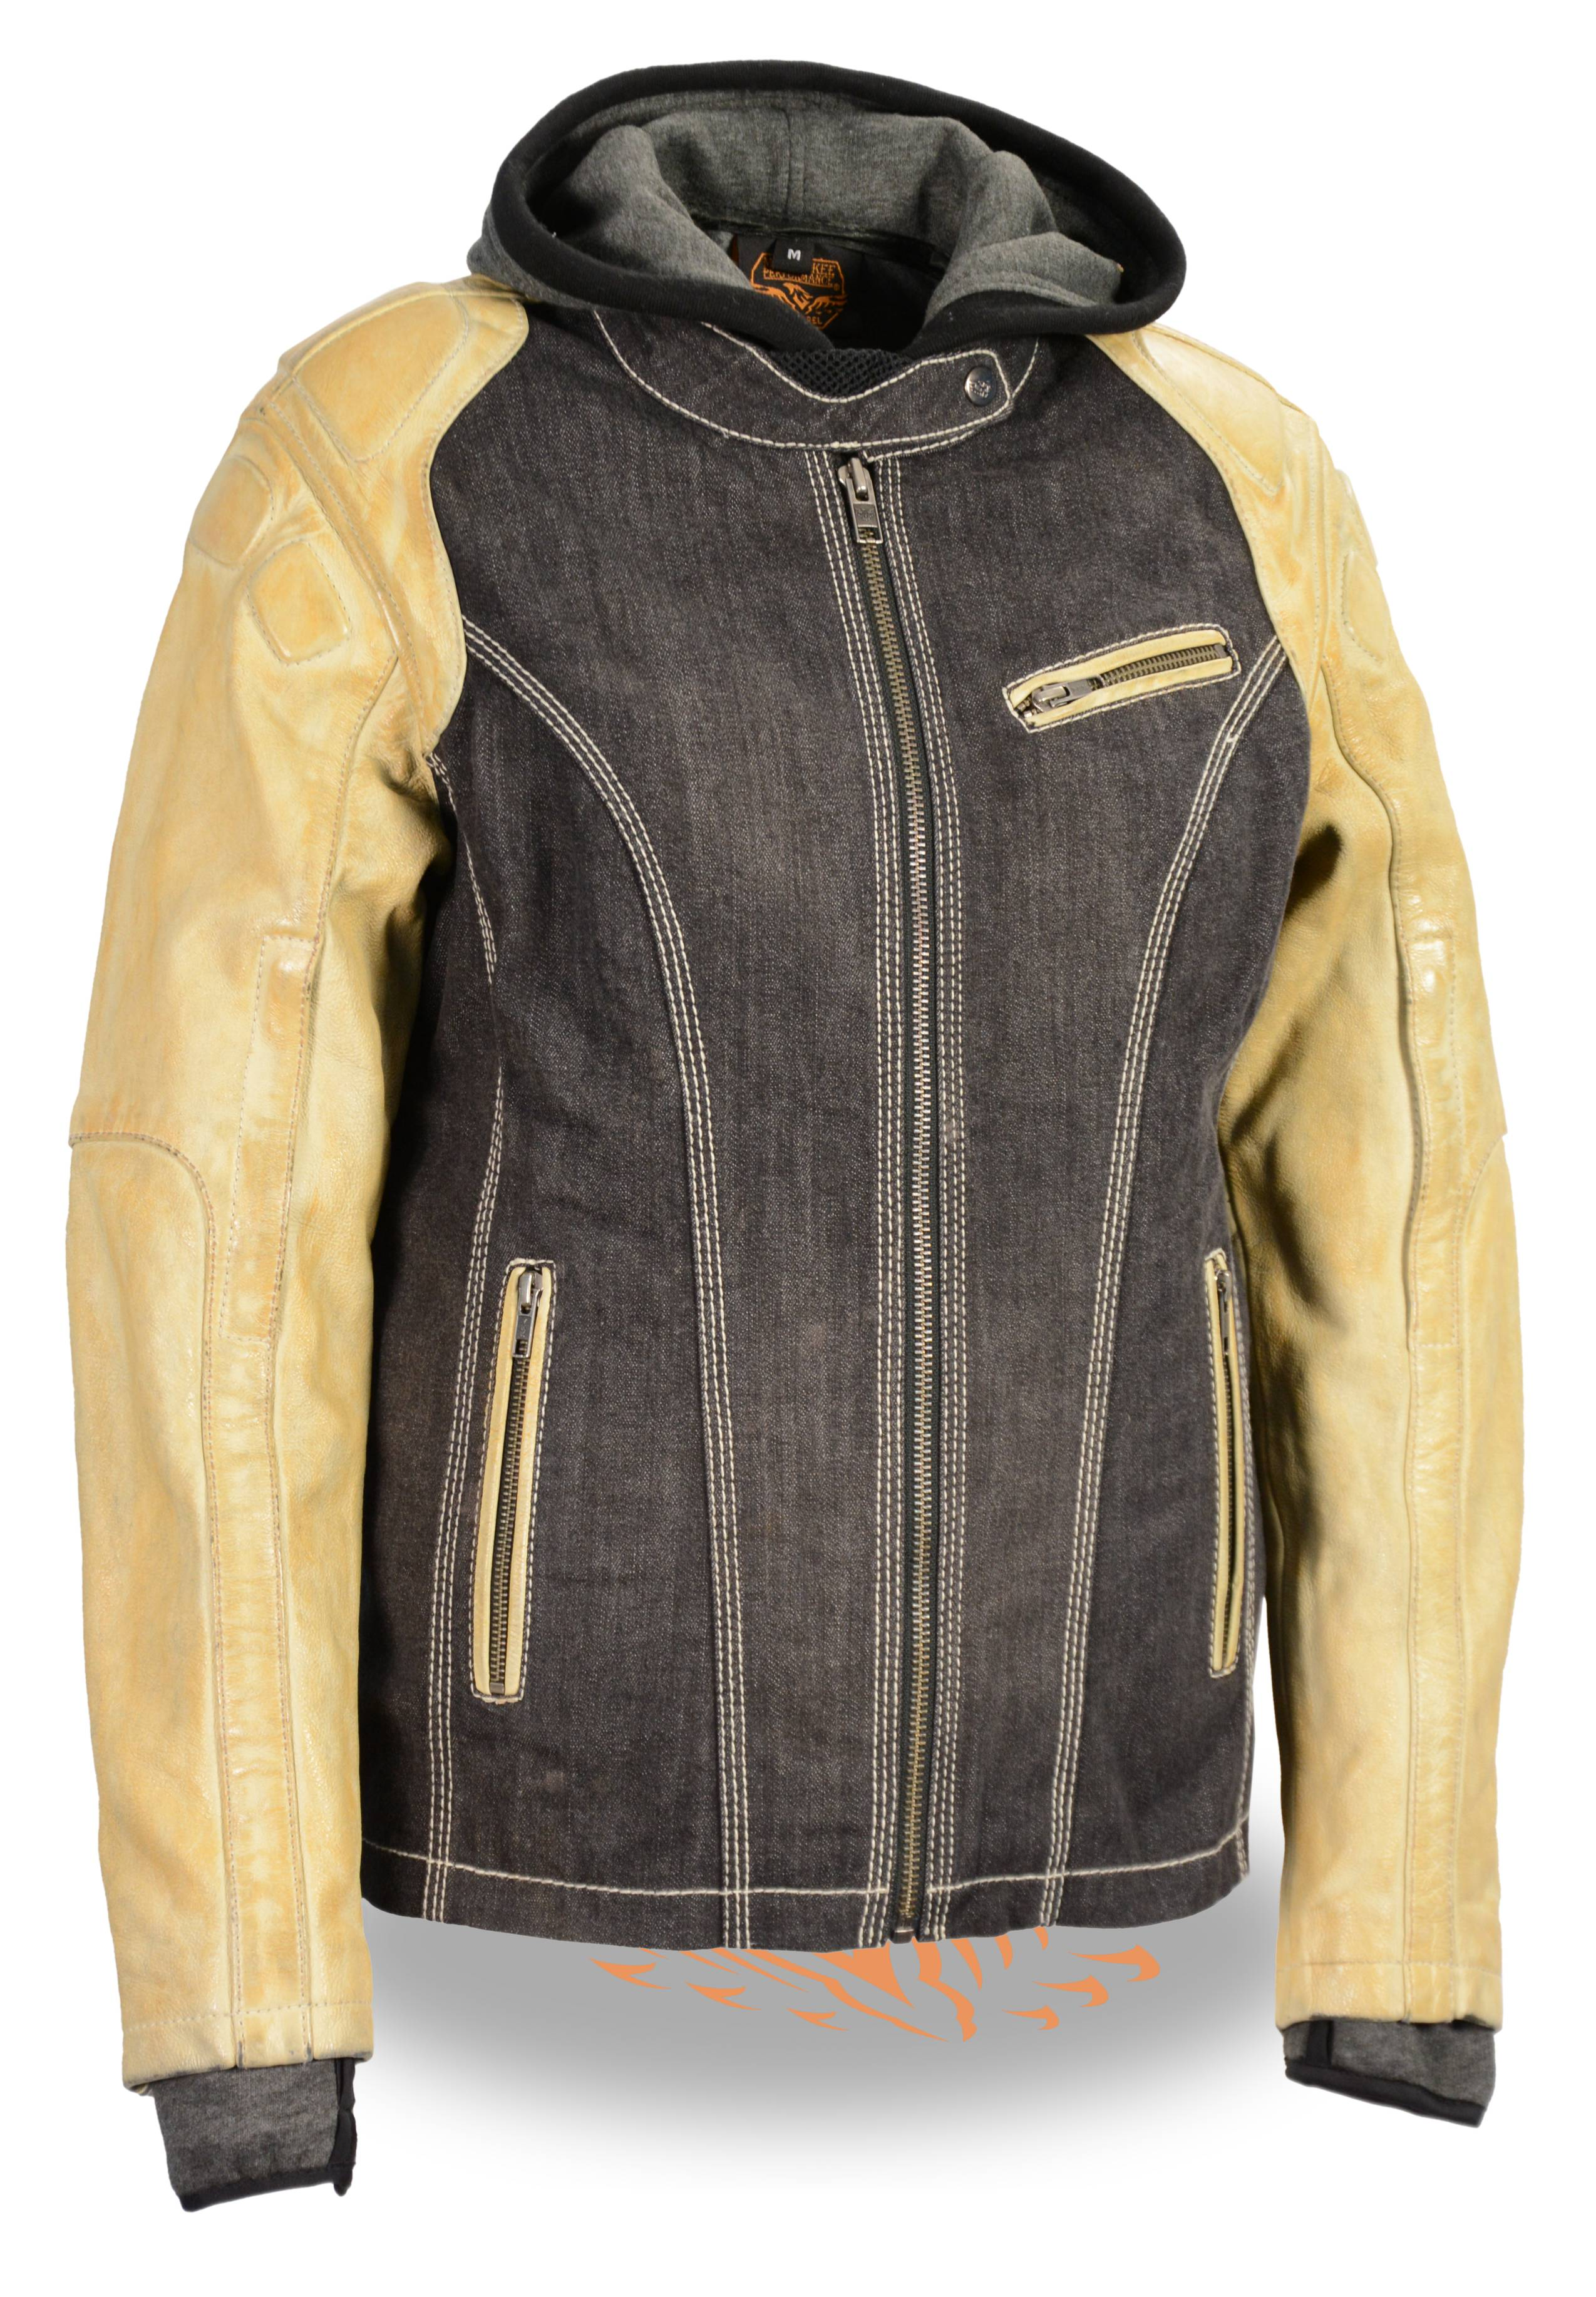 524b6ef5caee7 Ladies Two Tone Denim and Leather Scuba Jacket w Full Hoodie Liner